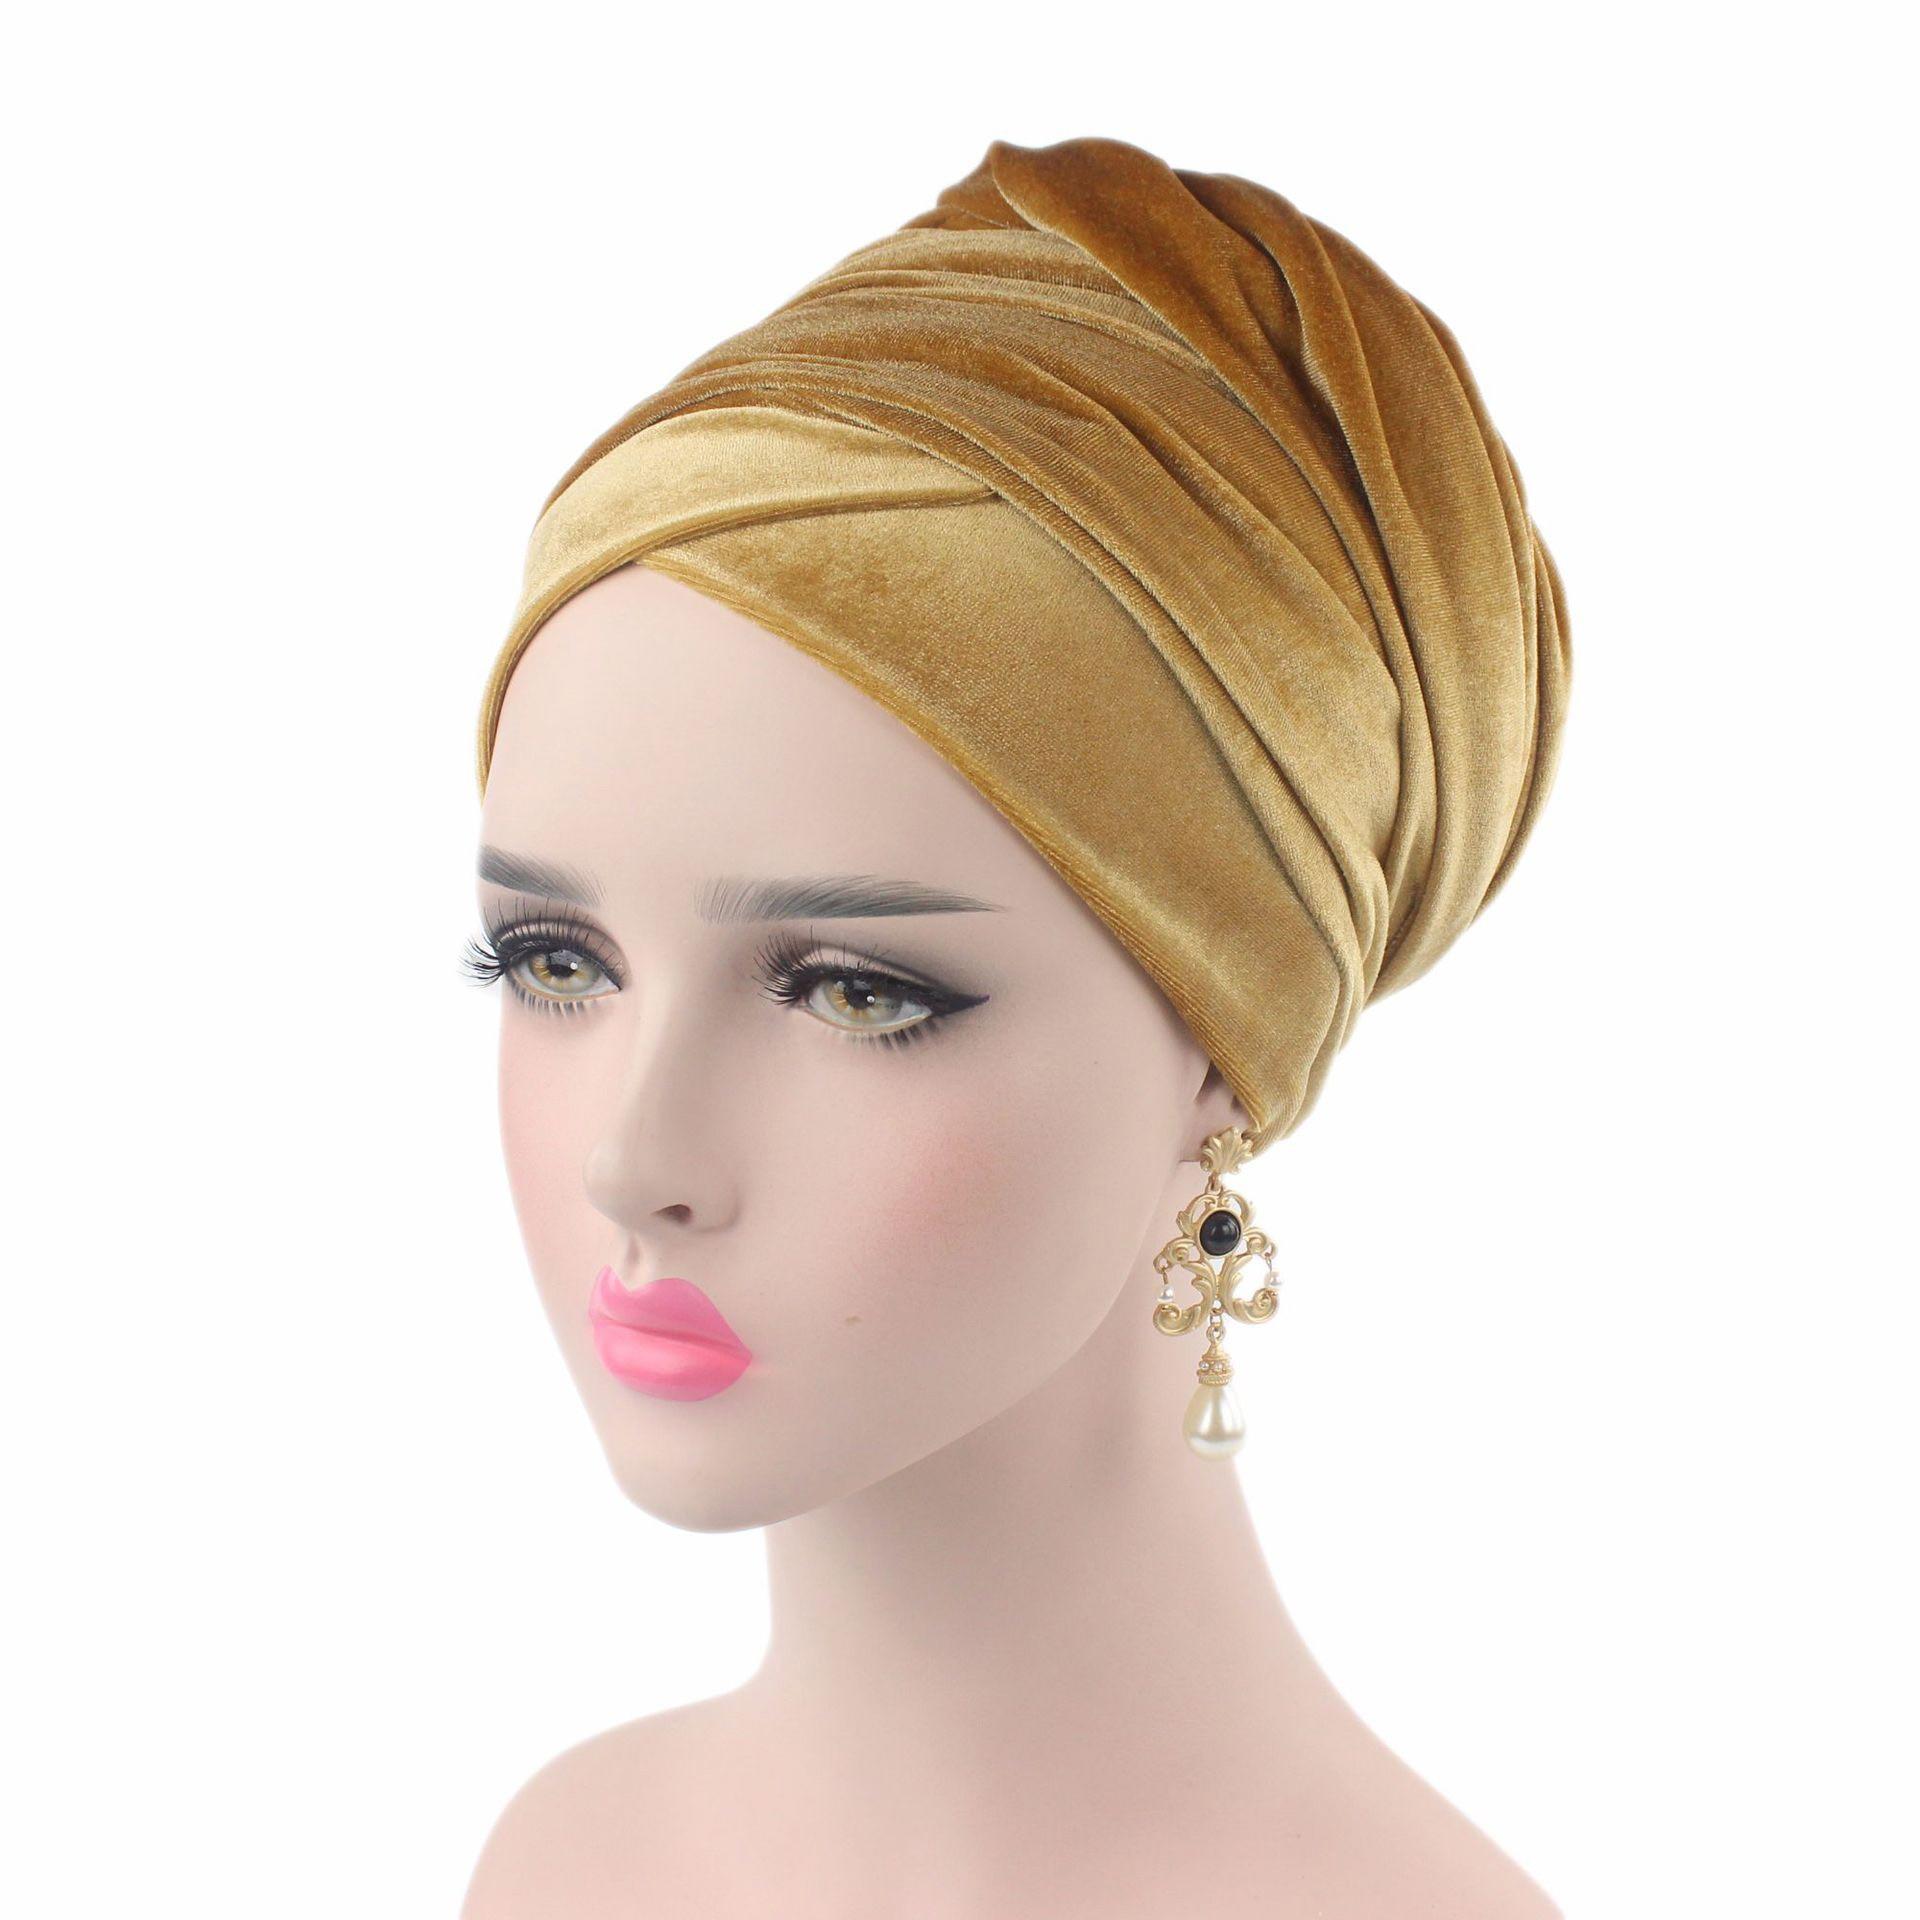 2019 Plain Velvet Hijab Turban Cap Muslim Long-tailed Headscarf Hat Islamic Under Scarf Bonnet Ladies African Wrap Head Scarves